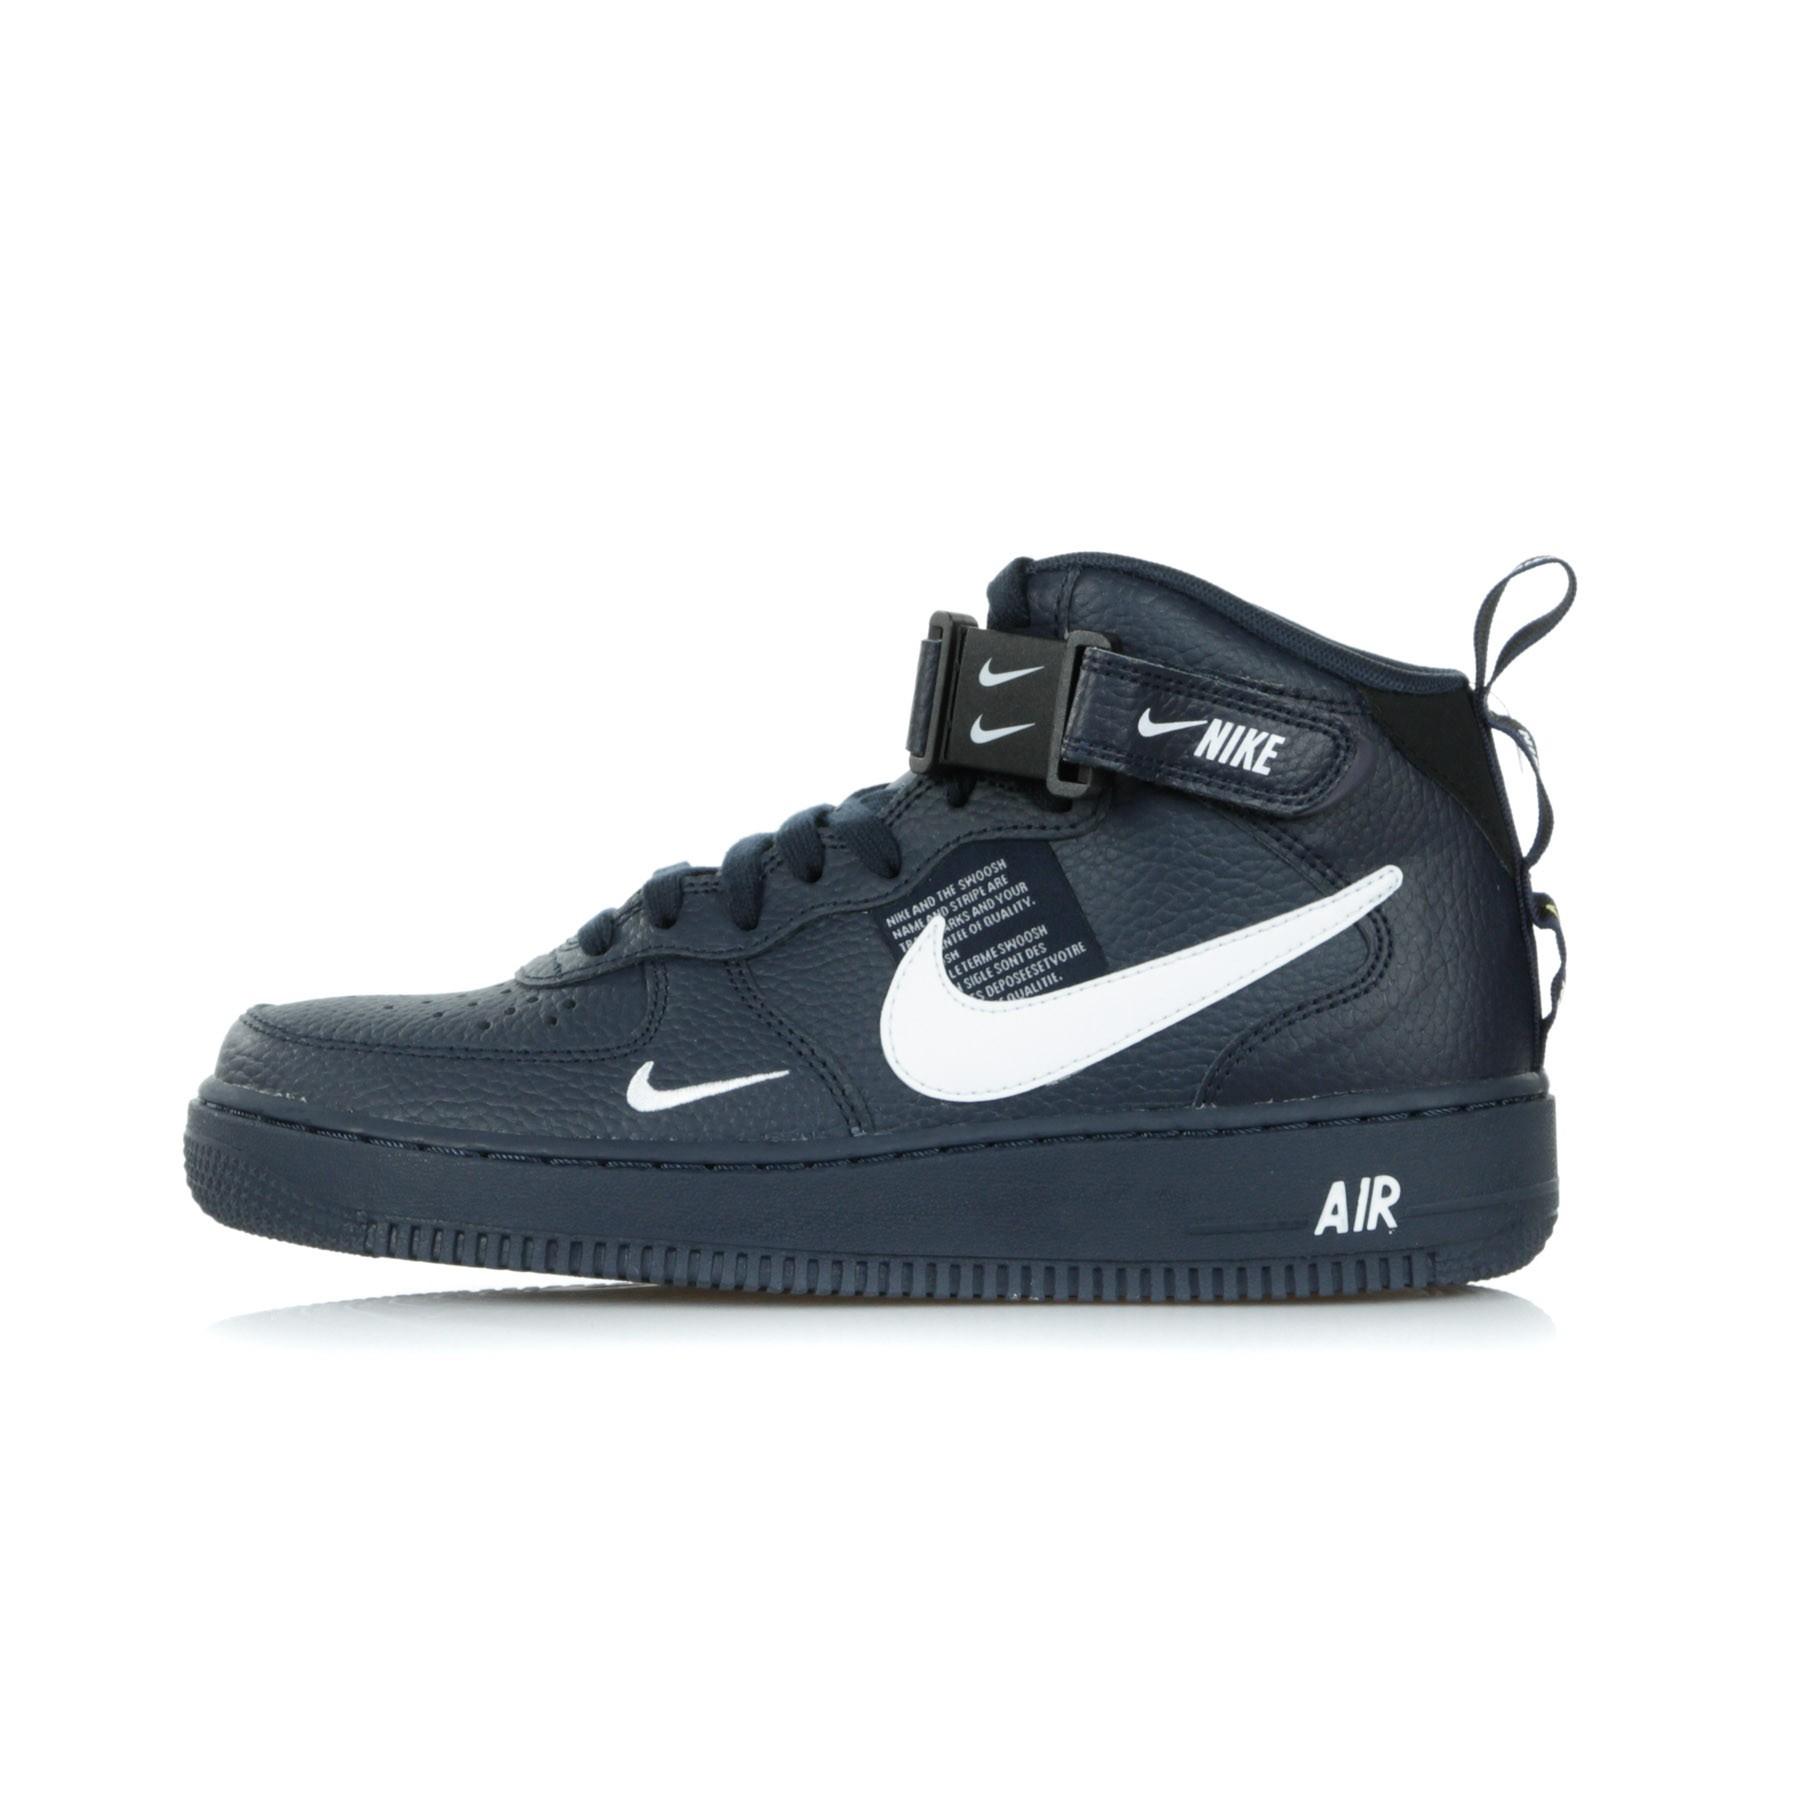 separation shoes 59e9e ad469 SCARPA ALTA AF1 MID 07 LV8 OBSIDIAN/WHITE/BLACK/TOUR YELLOW |  Atipicishop.com